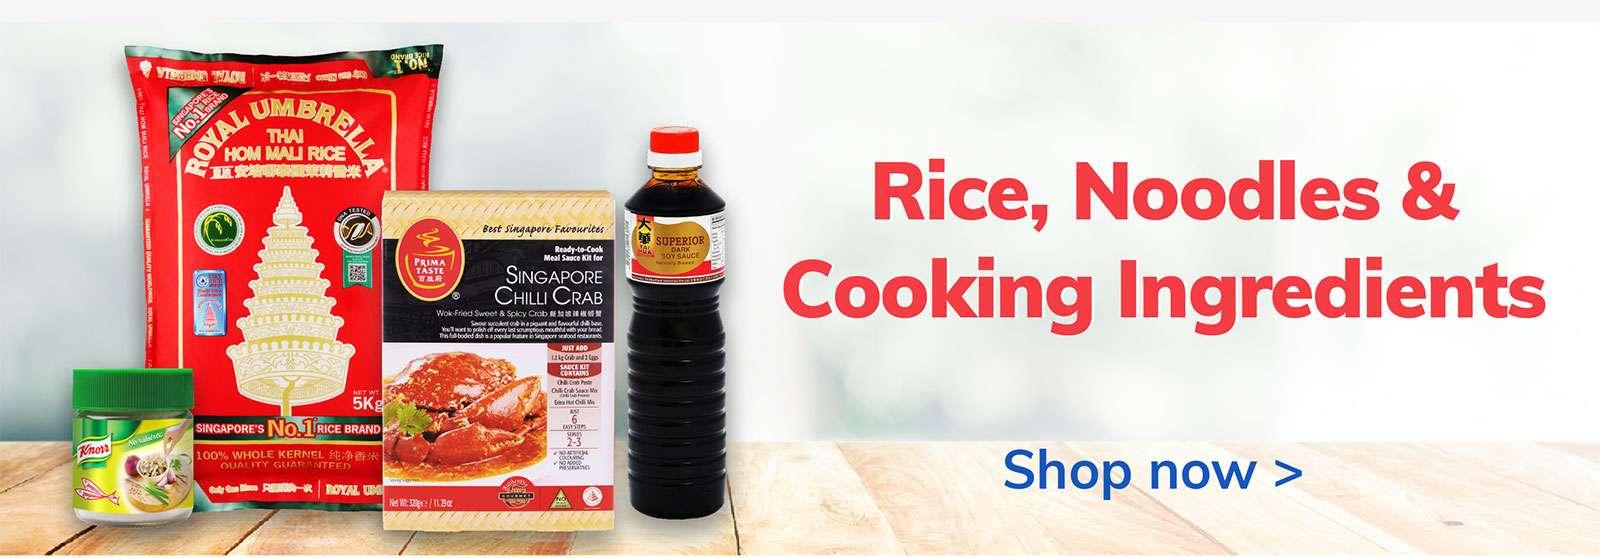 Rice, Noodles, Cooking Ingredients